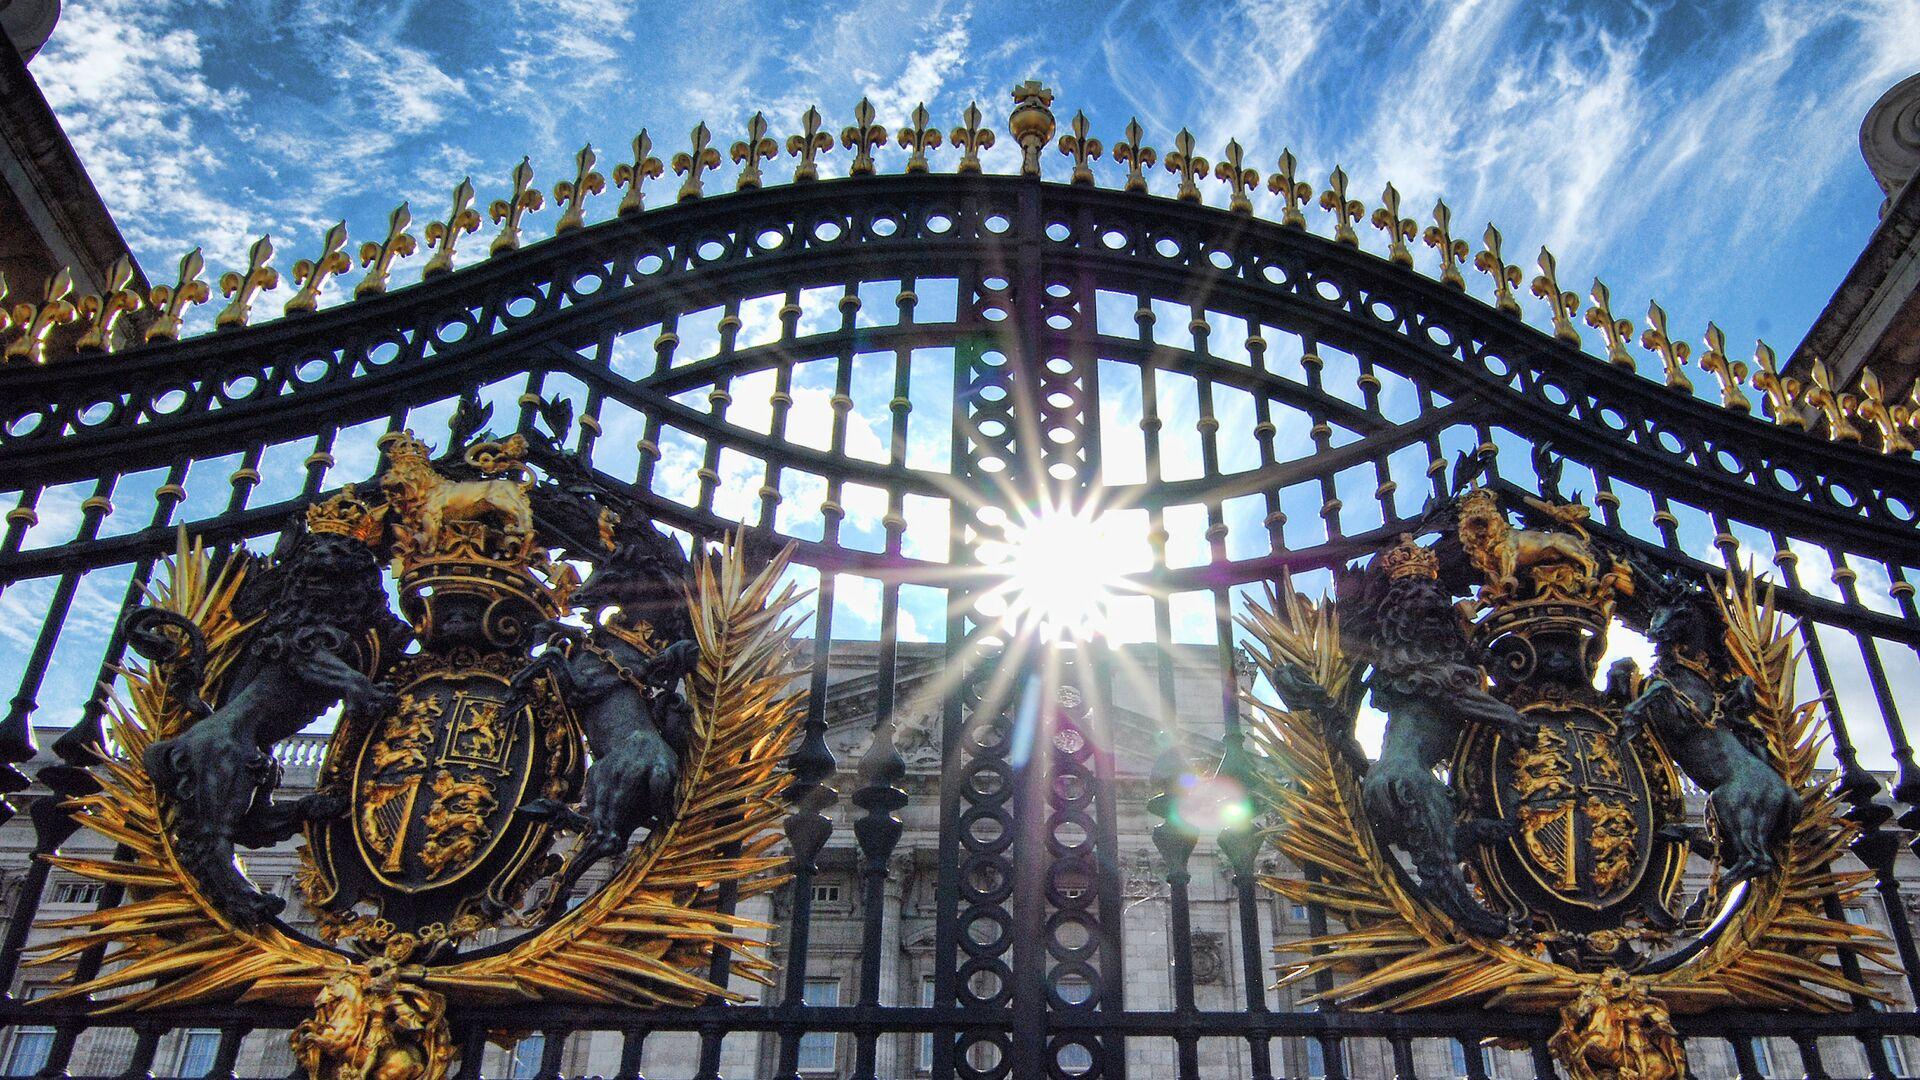 The Gates at Buckingham Palace - Sputnik Mundo, 1920, 10.04.2021